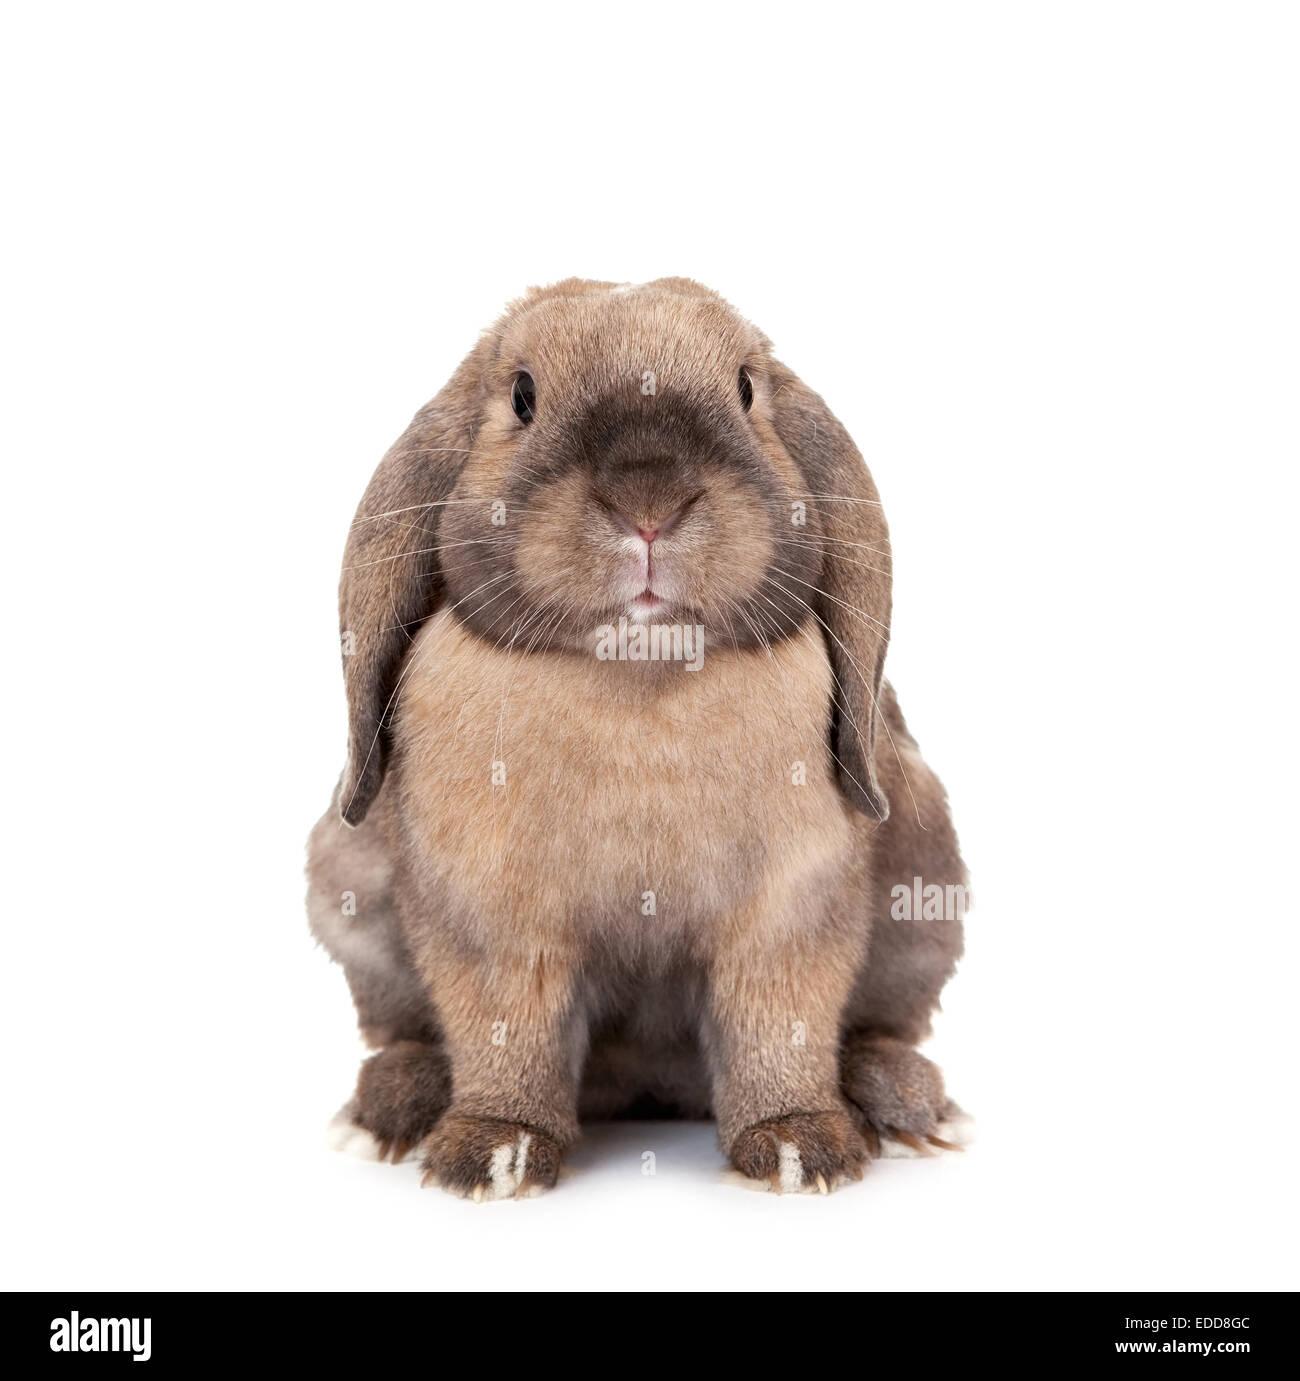 Rabbits are rams. Dwarf Rabbit Ram: breed description 85